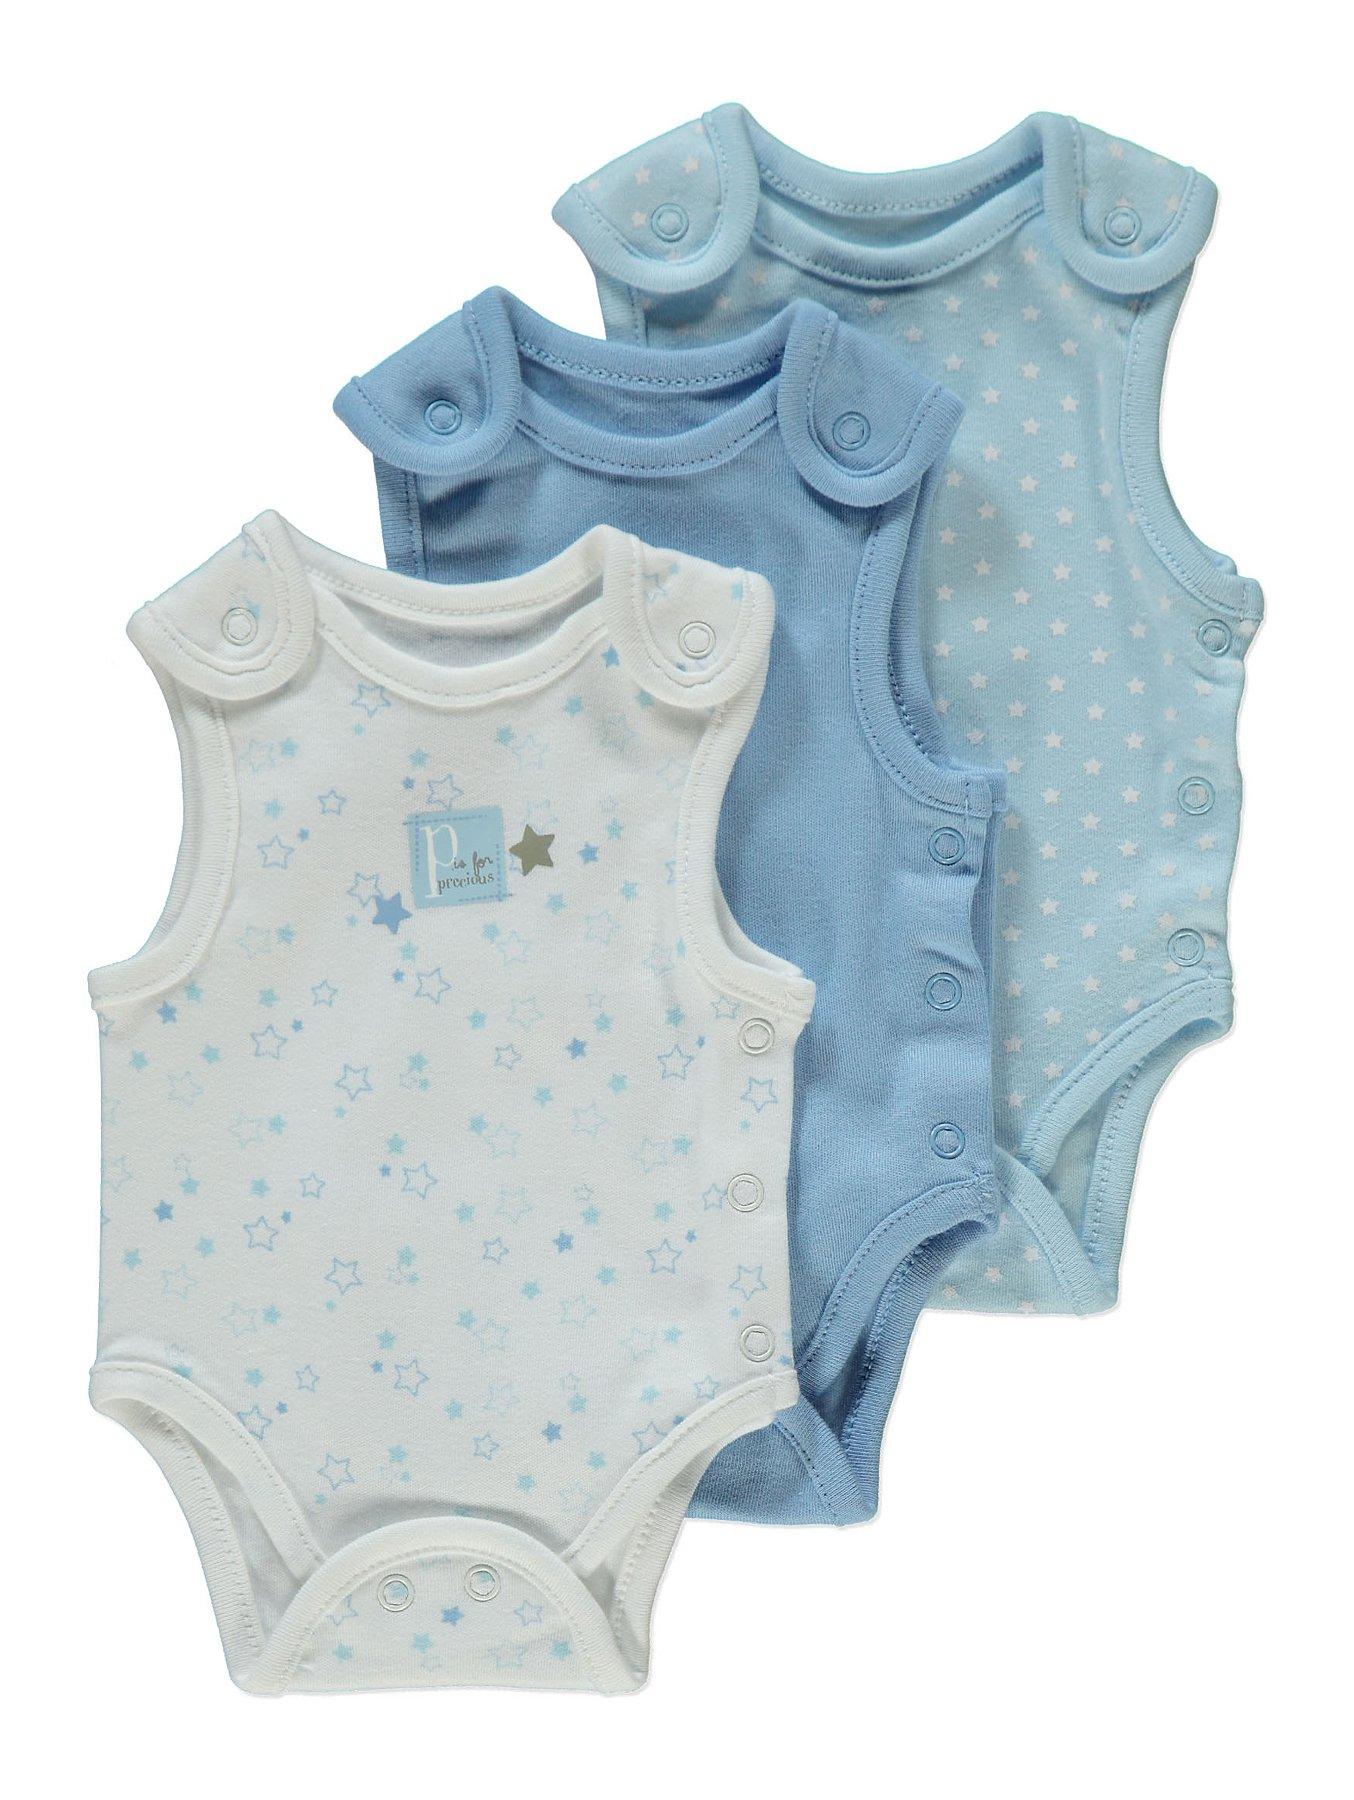 4e1e59c3873 Blue Premature Baby Bodysuit 3 Pack   Baby   George